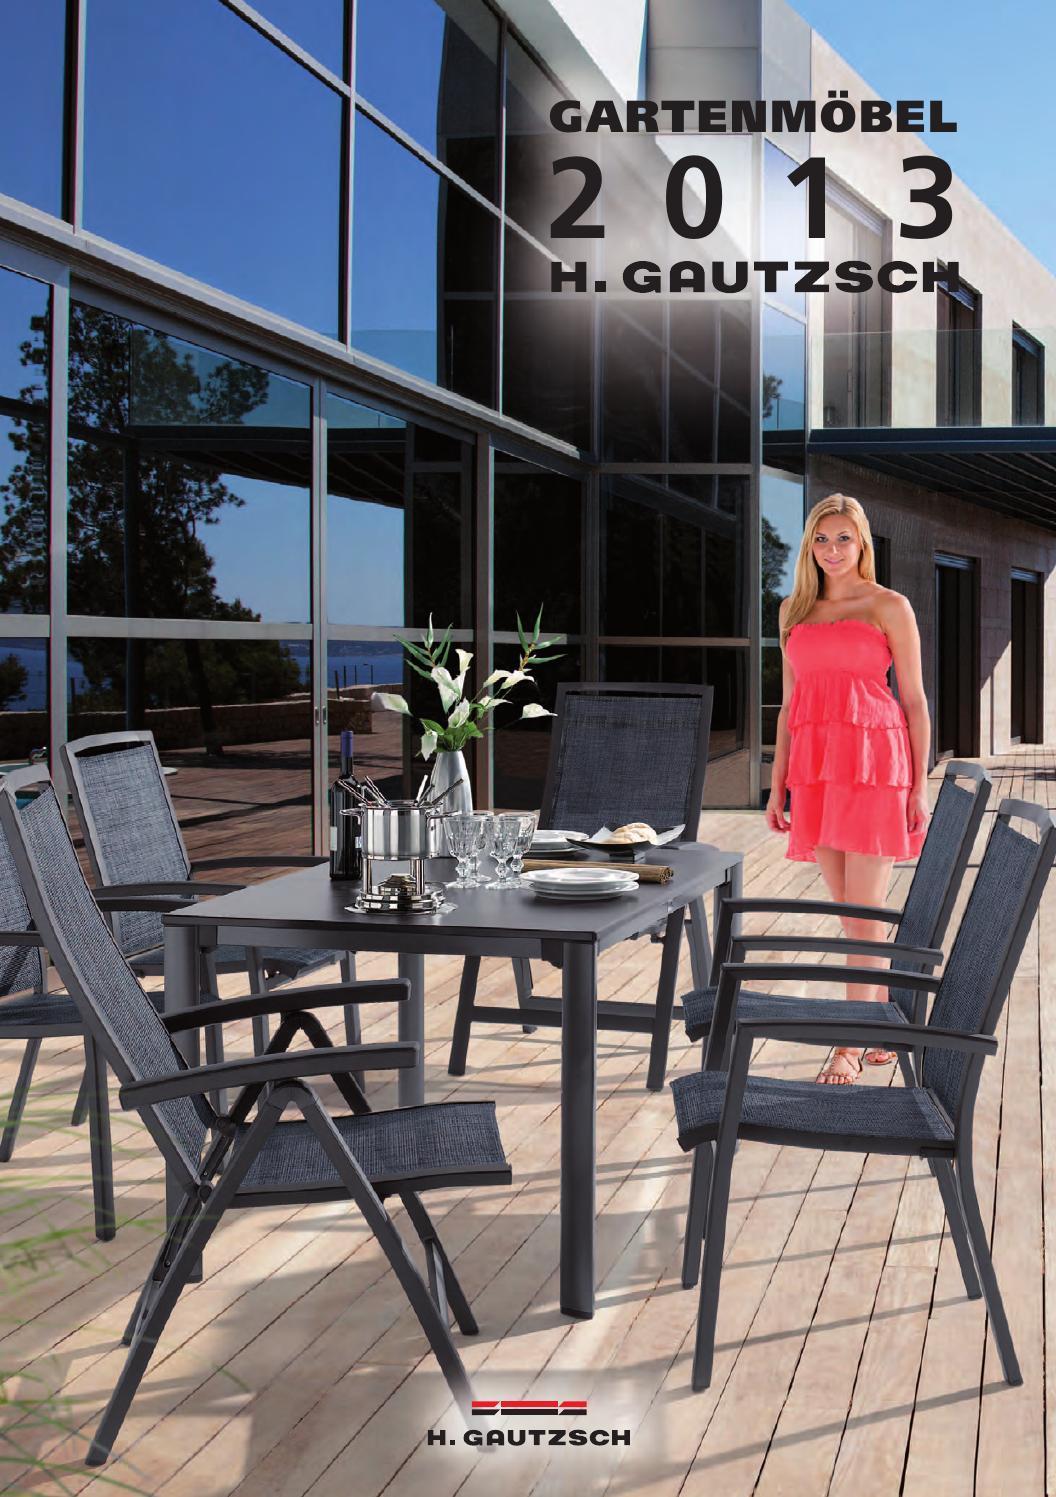 gartenmoebel 2013 by pawe jopp issuu. Black Bedroom Furniture Sets. Home Design Ideas